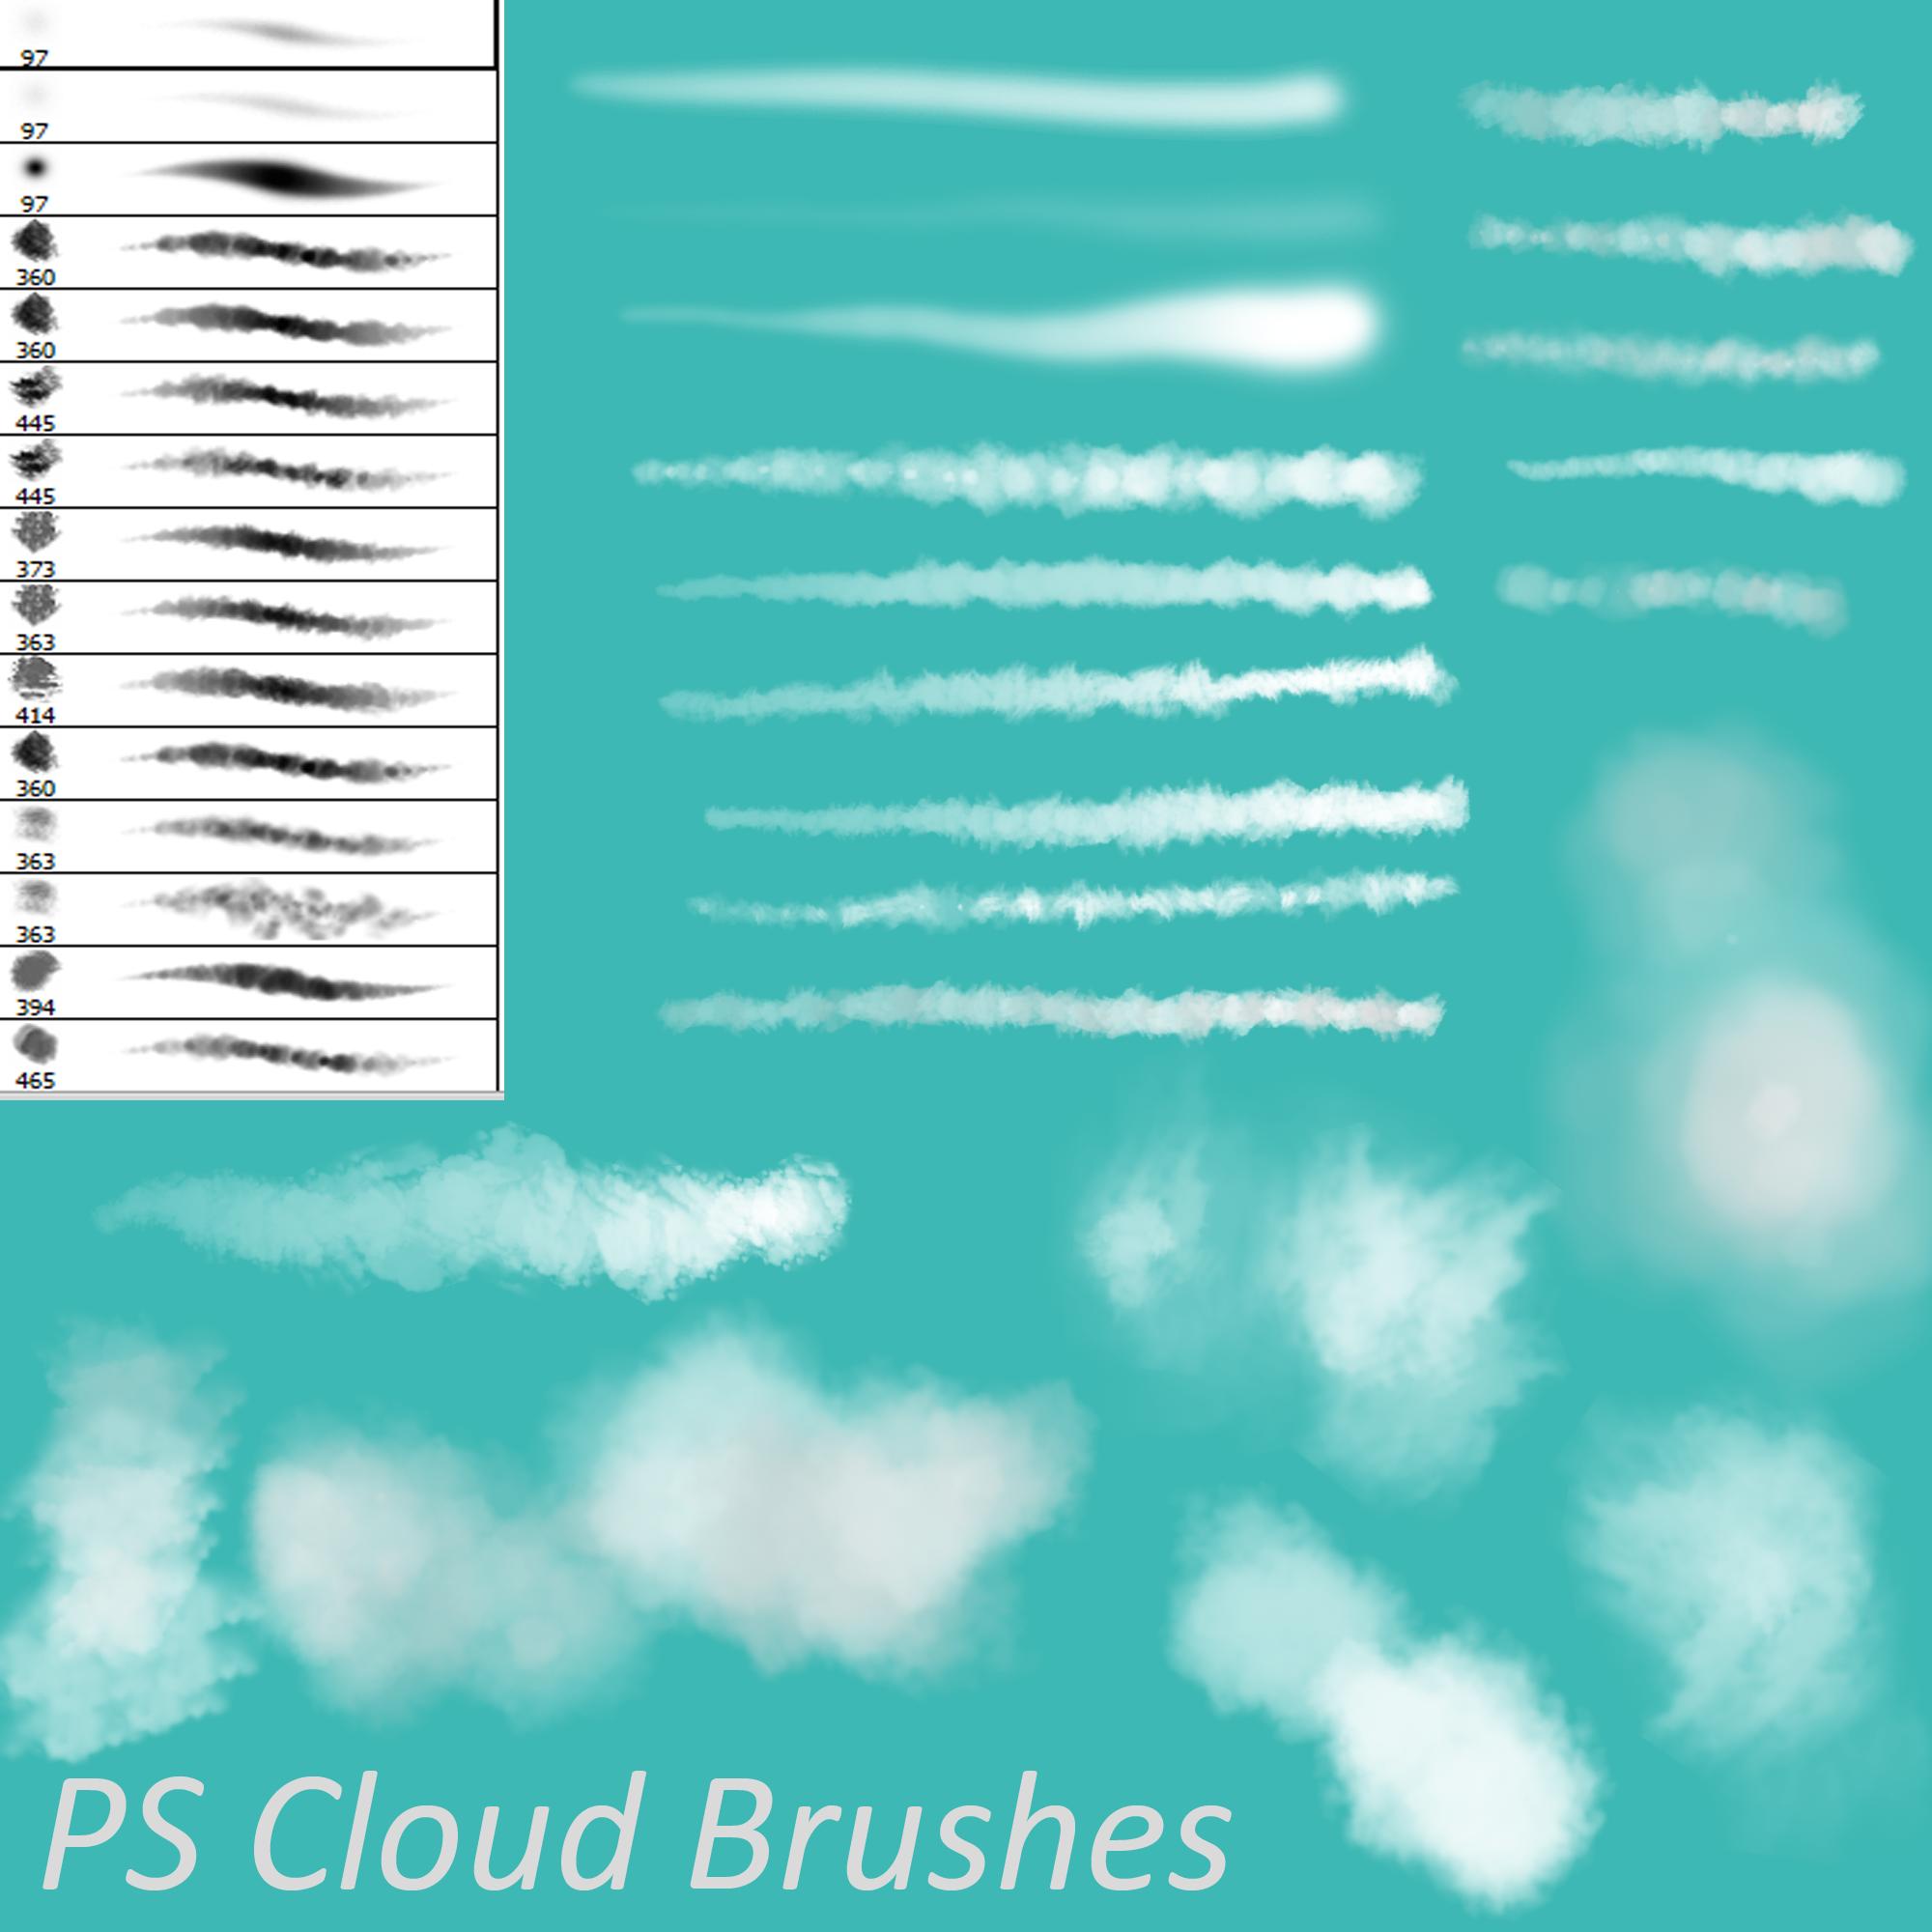 PS Cloud Brushes by Dark-Zeblock